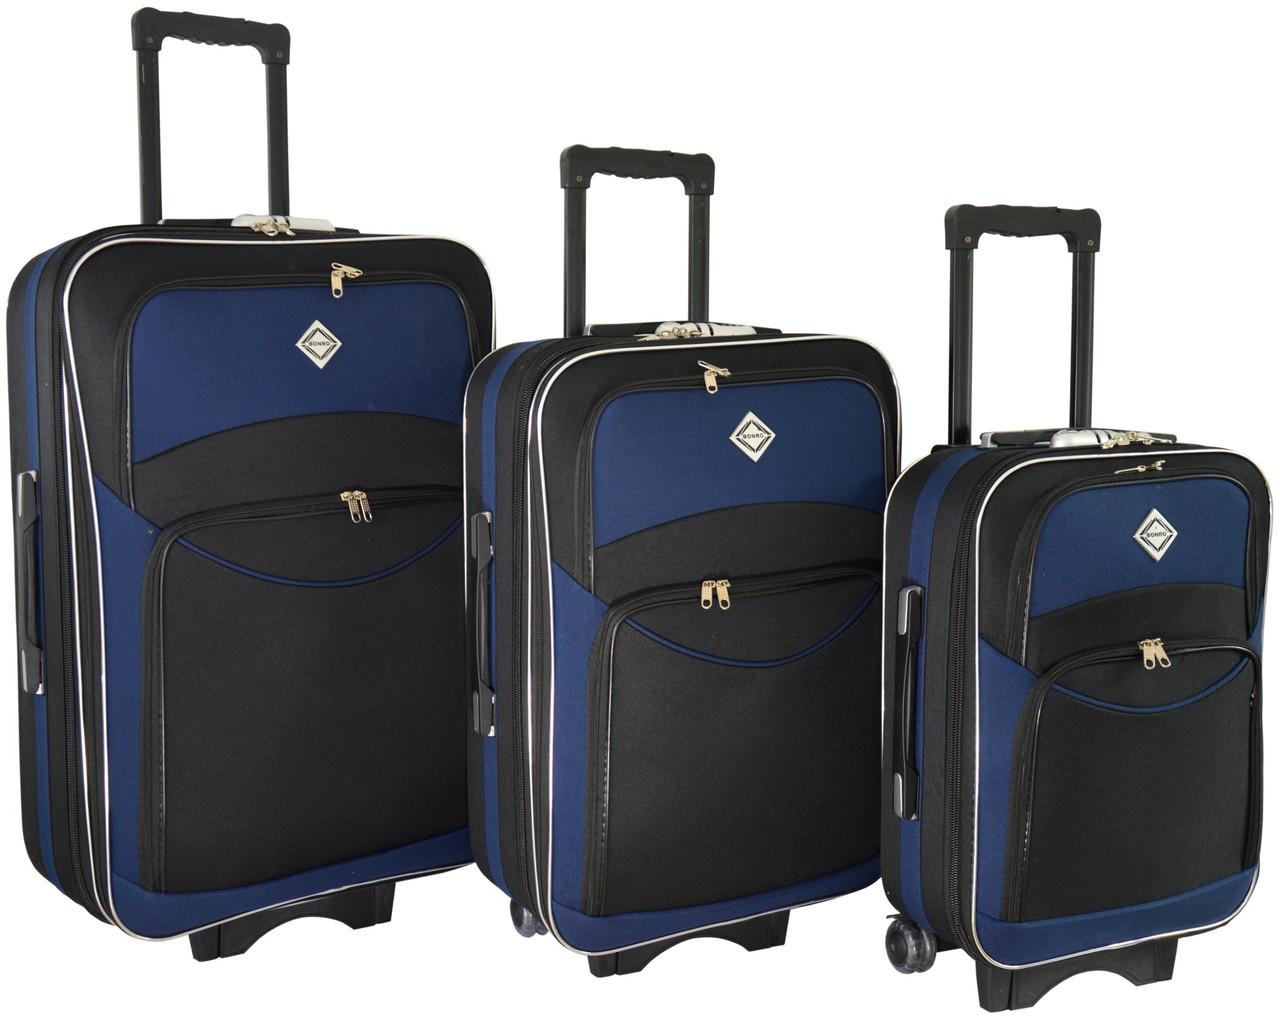 2e631a19115c Набор чемоданов Bonro Style 3 штуки черно-т.синий (110109)  продажа ...